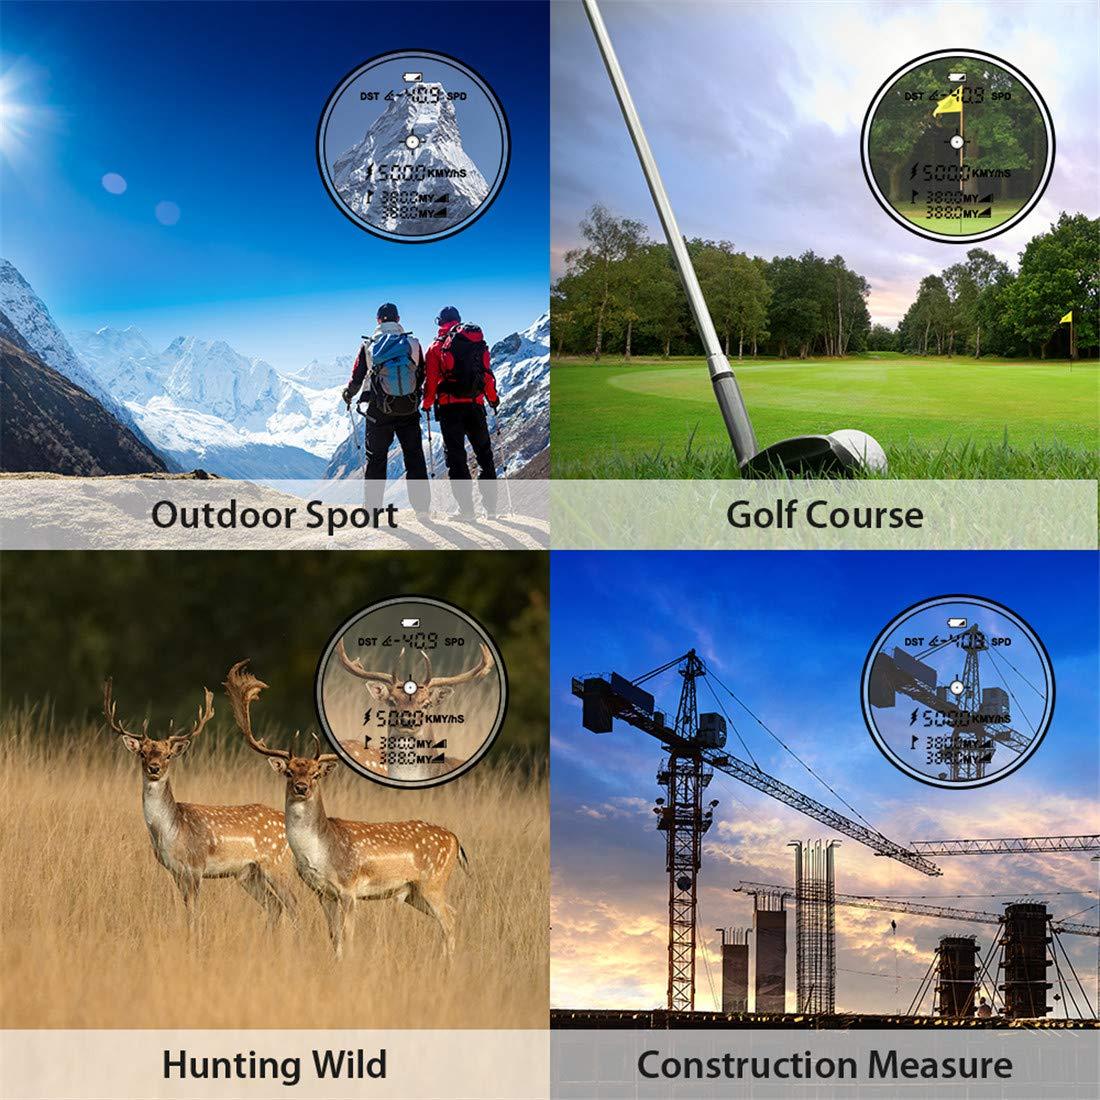 Laser Rangefinder,Zamkol 1000 yards Golf Rangefinder,IP54 Laser Binoculars For Hunting,Multi-Function Hunting Rangefinder with Speed /Vertical Height/Angle /Horizontal Distance Measurement